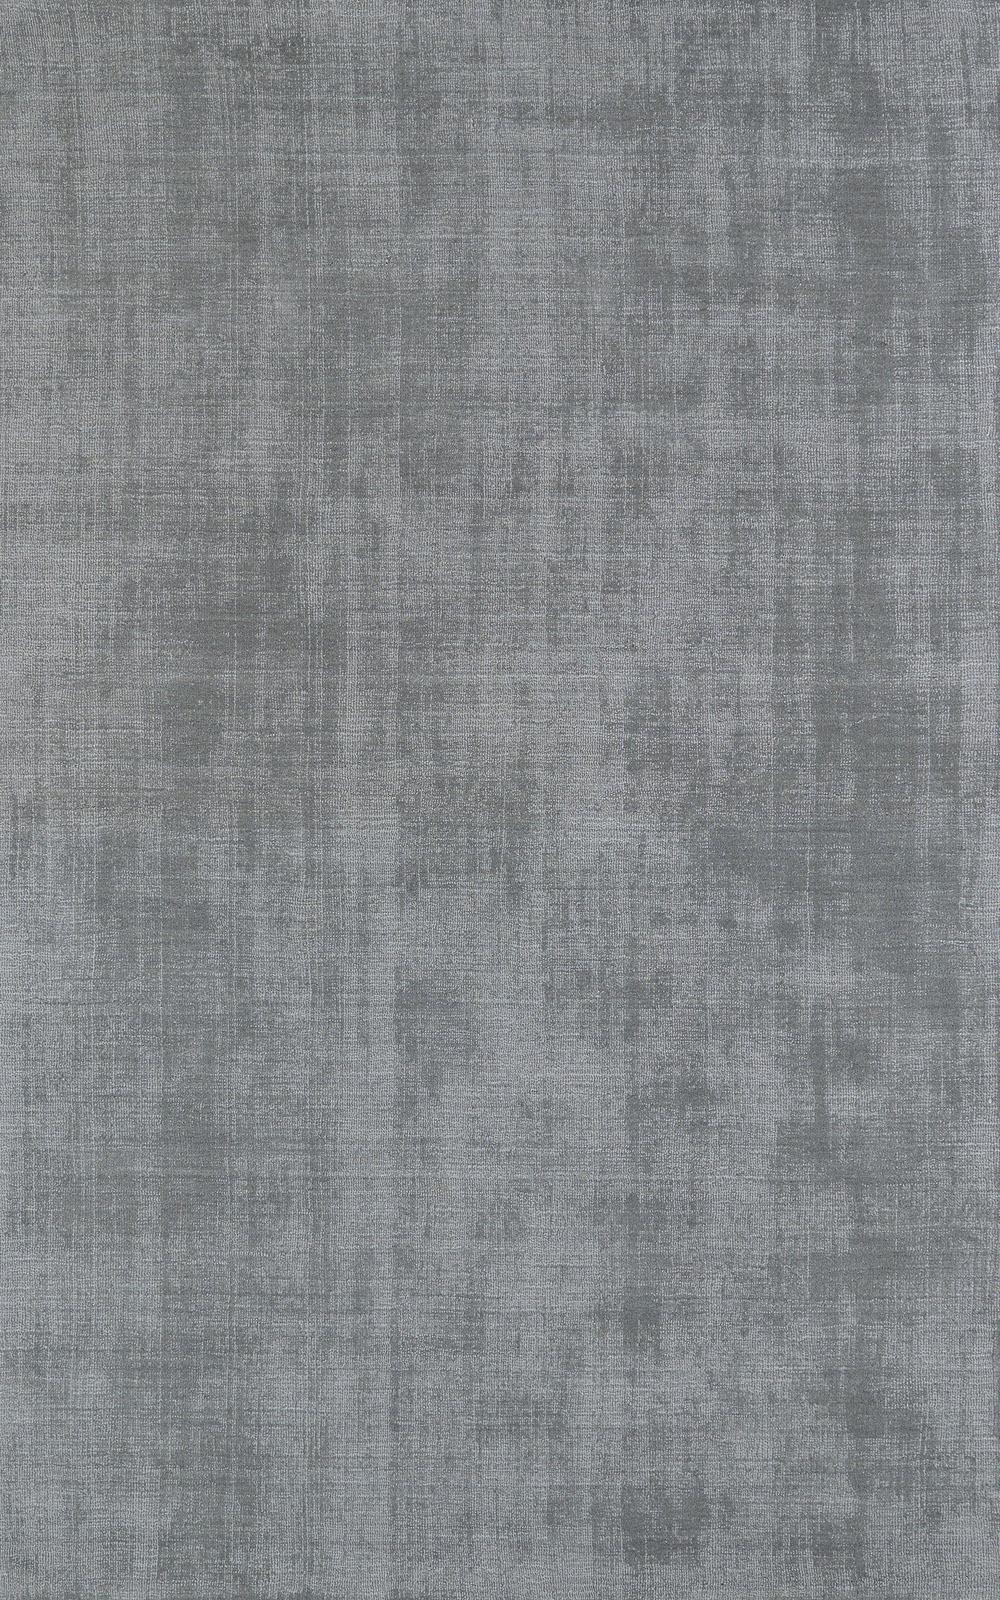 Laramie Silver Hand Loomed Wool Amp Viscose Yarns Rug